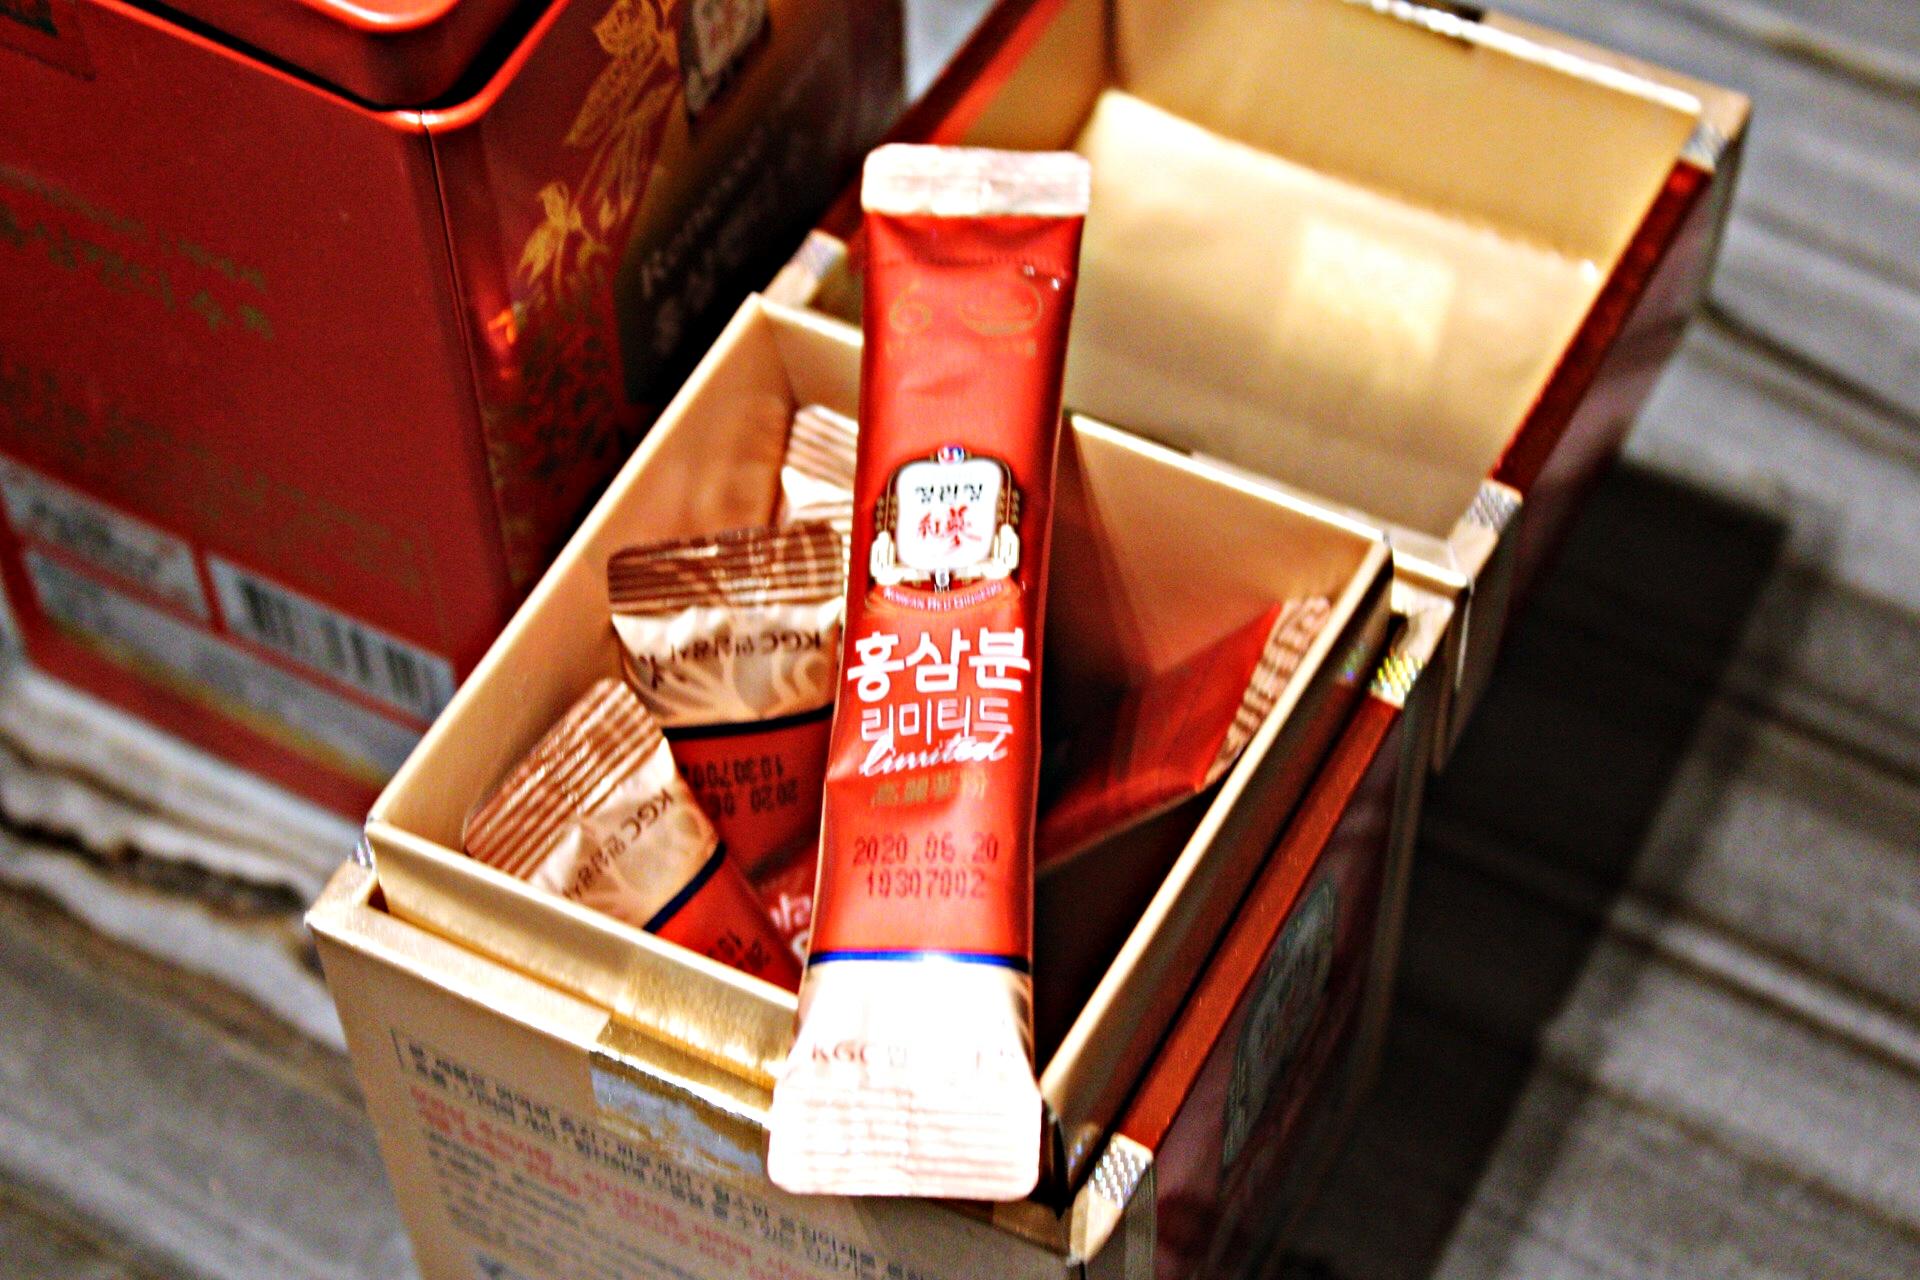 Limited RKG Ginseng Powder